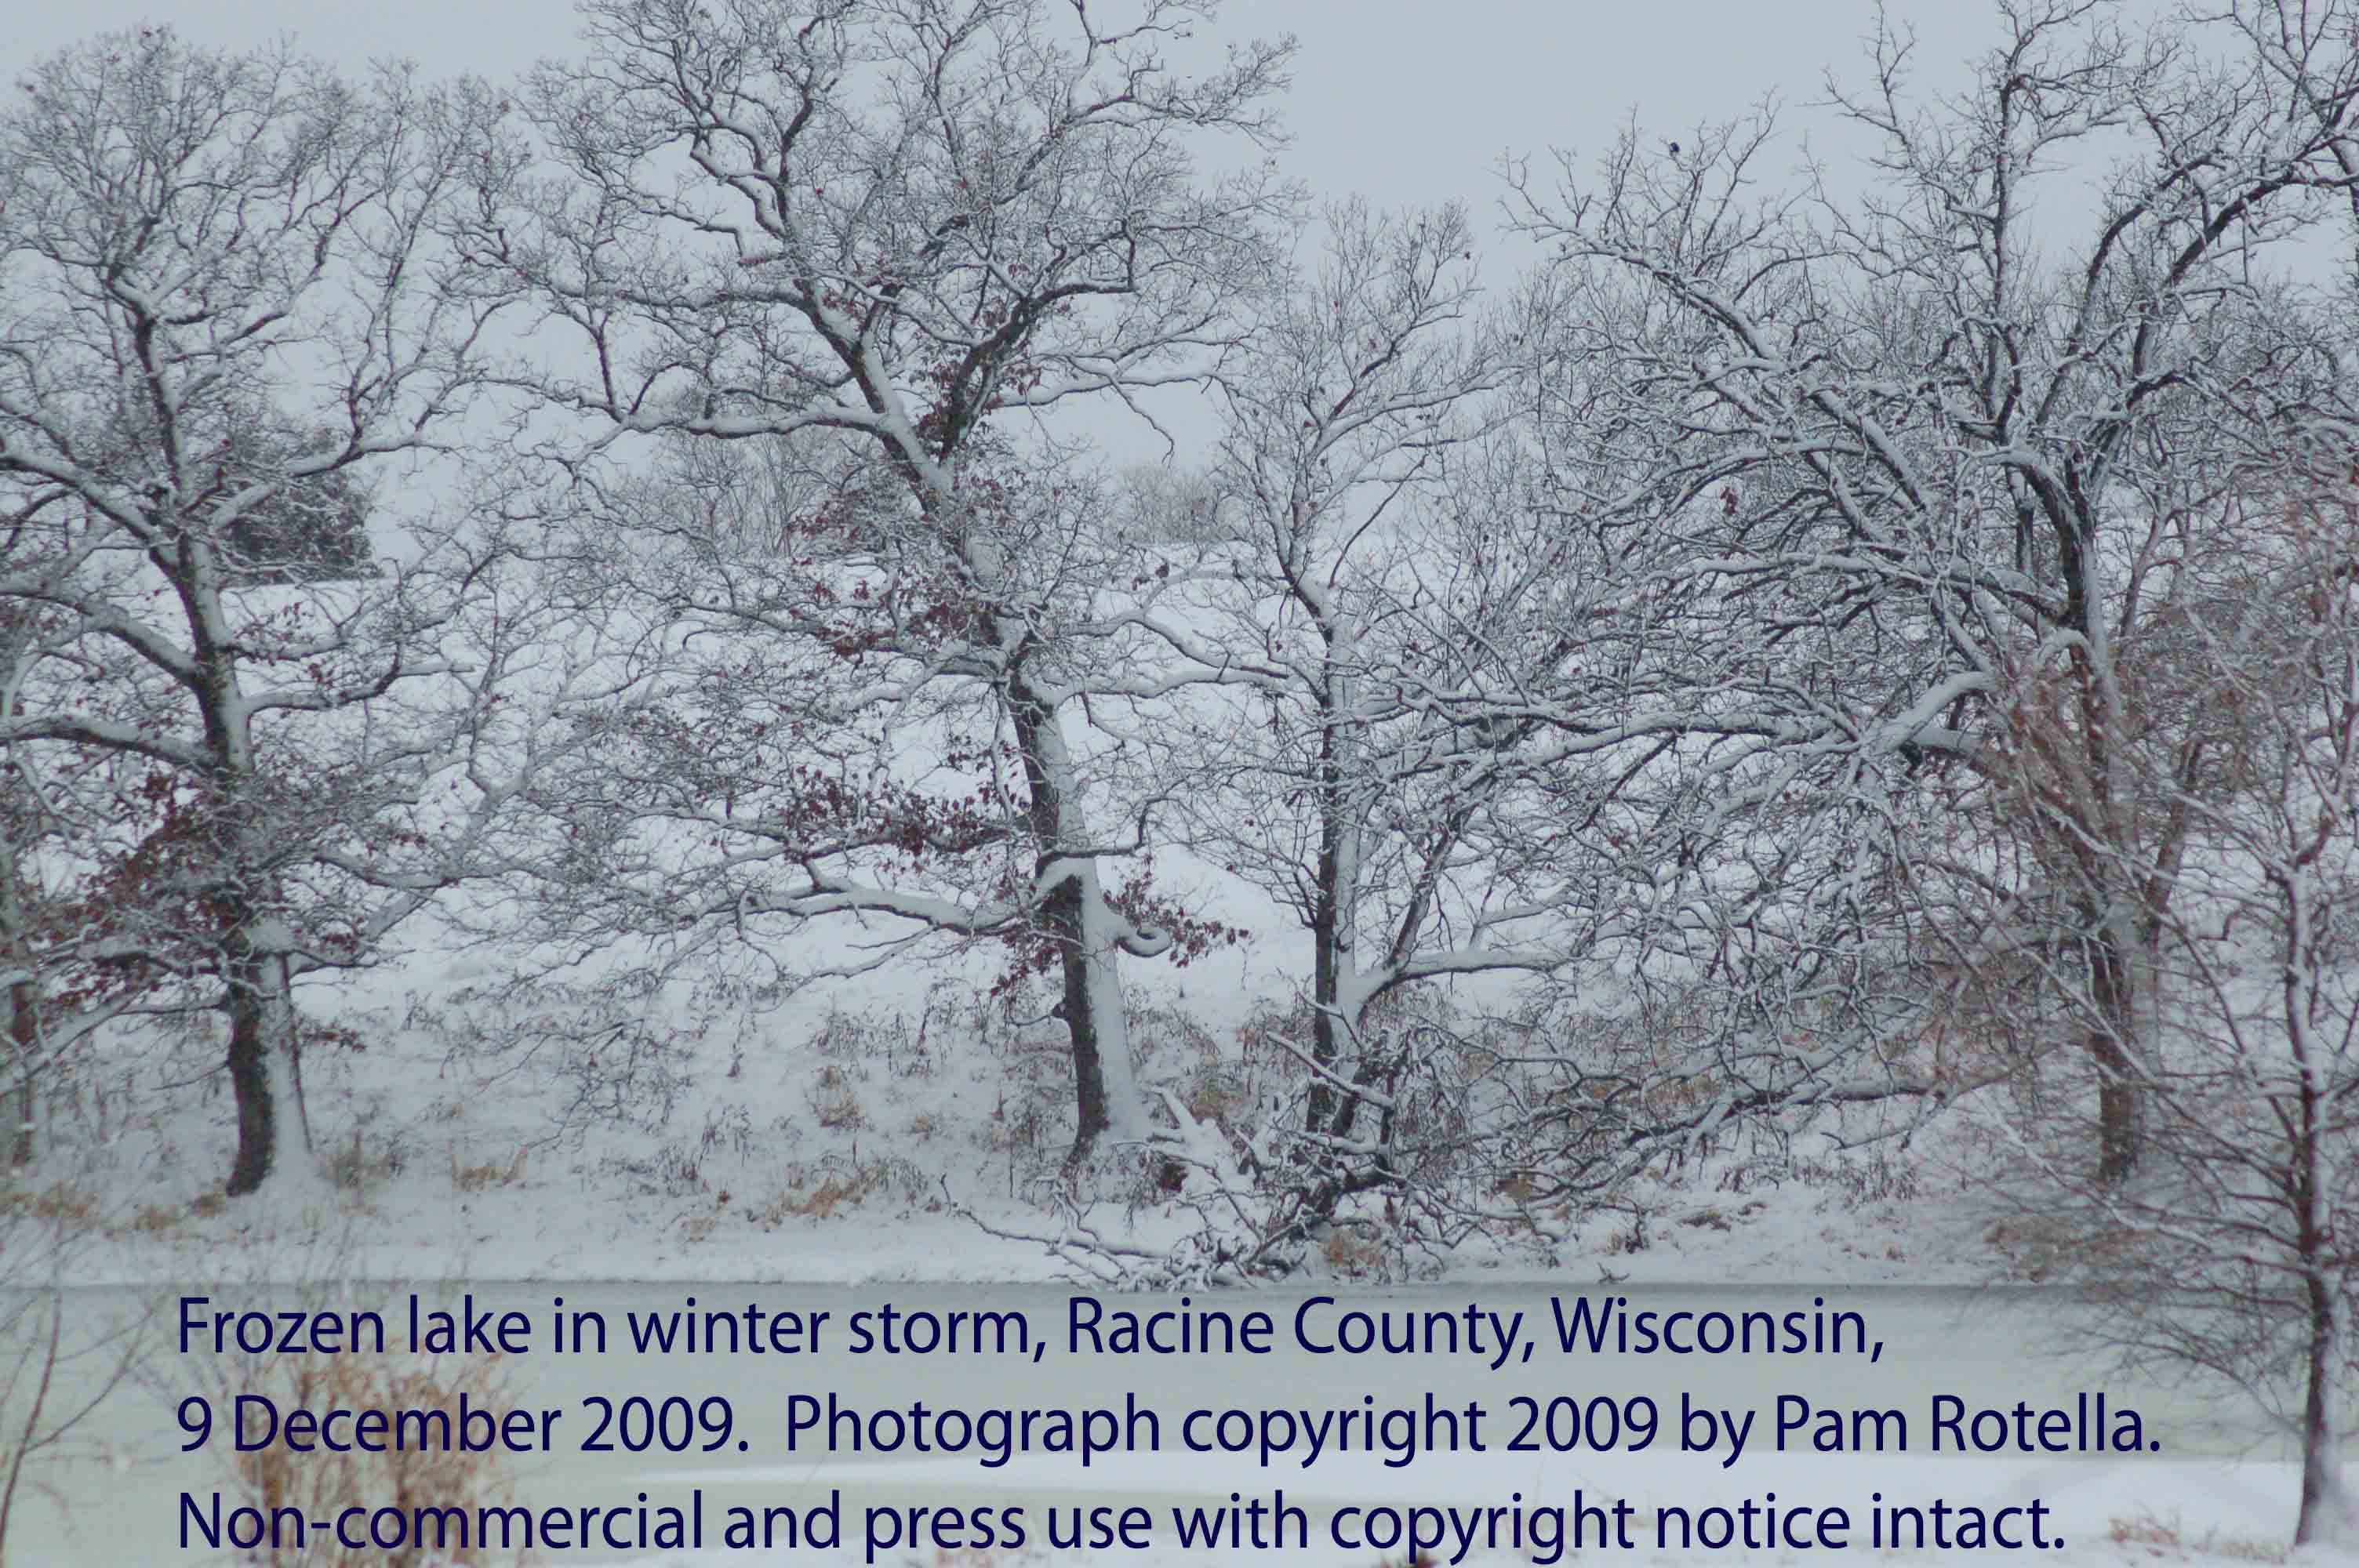 Winter storms, frozen lake, Racine County, WI, 9 Dec 2009